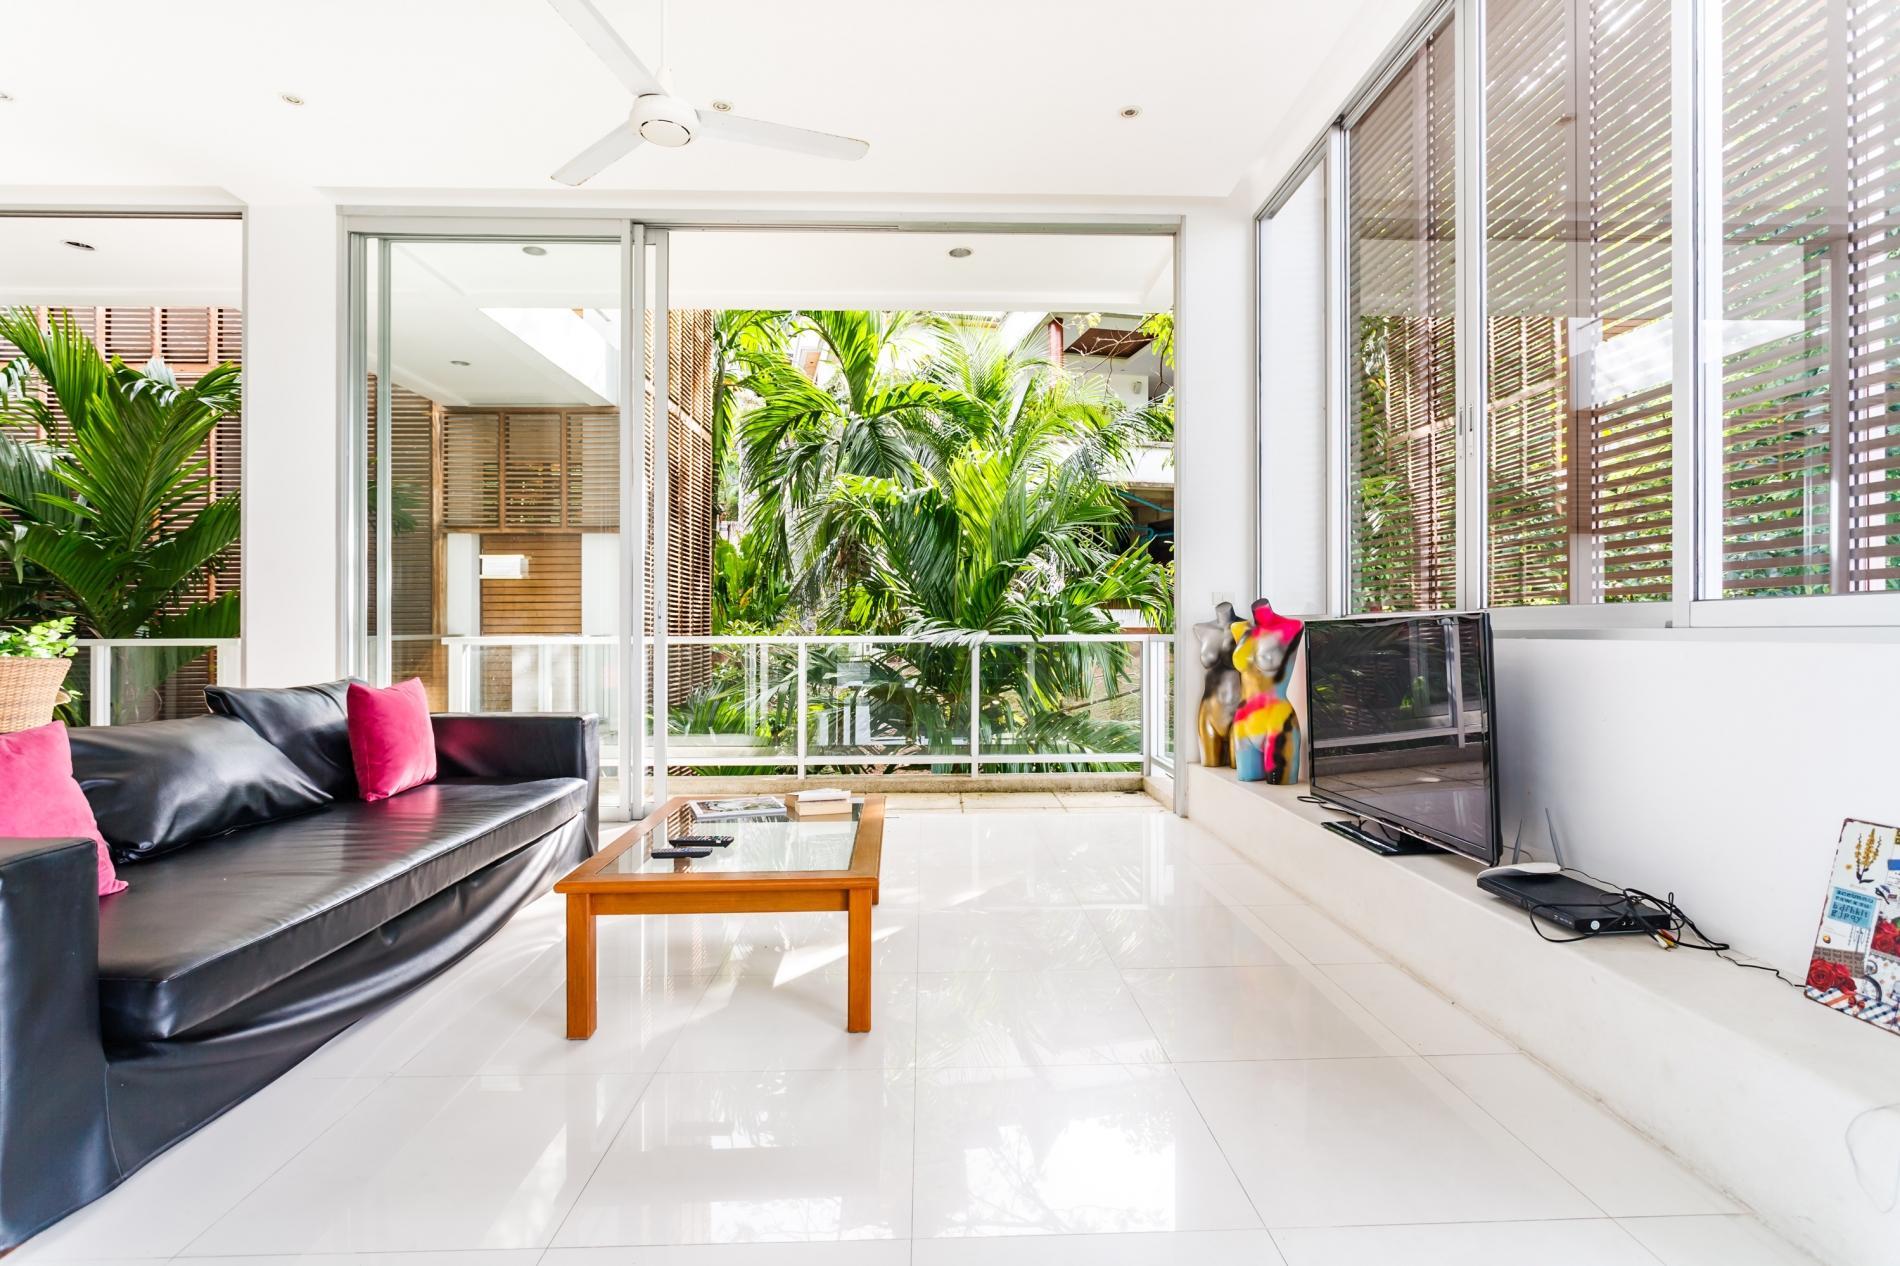 Apartment The Quarter 301 - Luxury Surin 3 bedroom apartment private pool photo 20339838